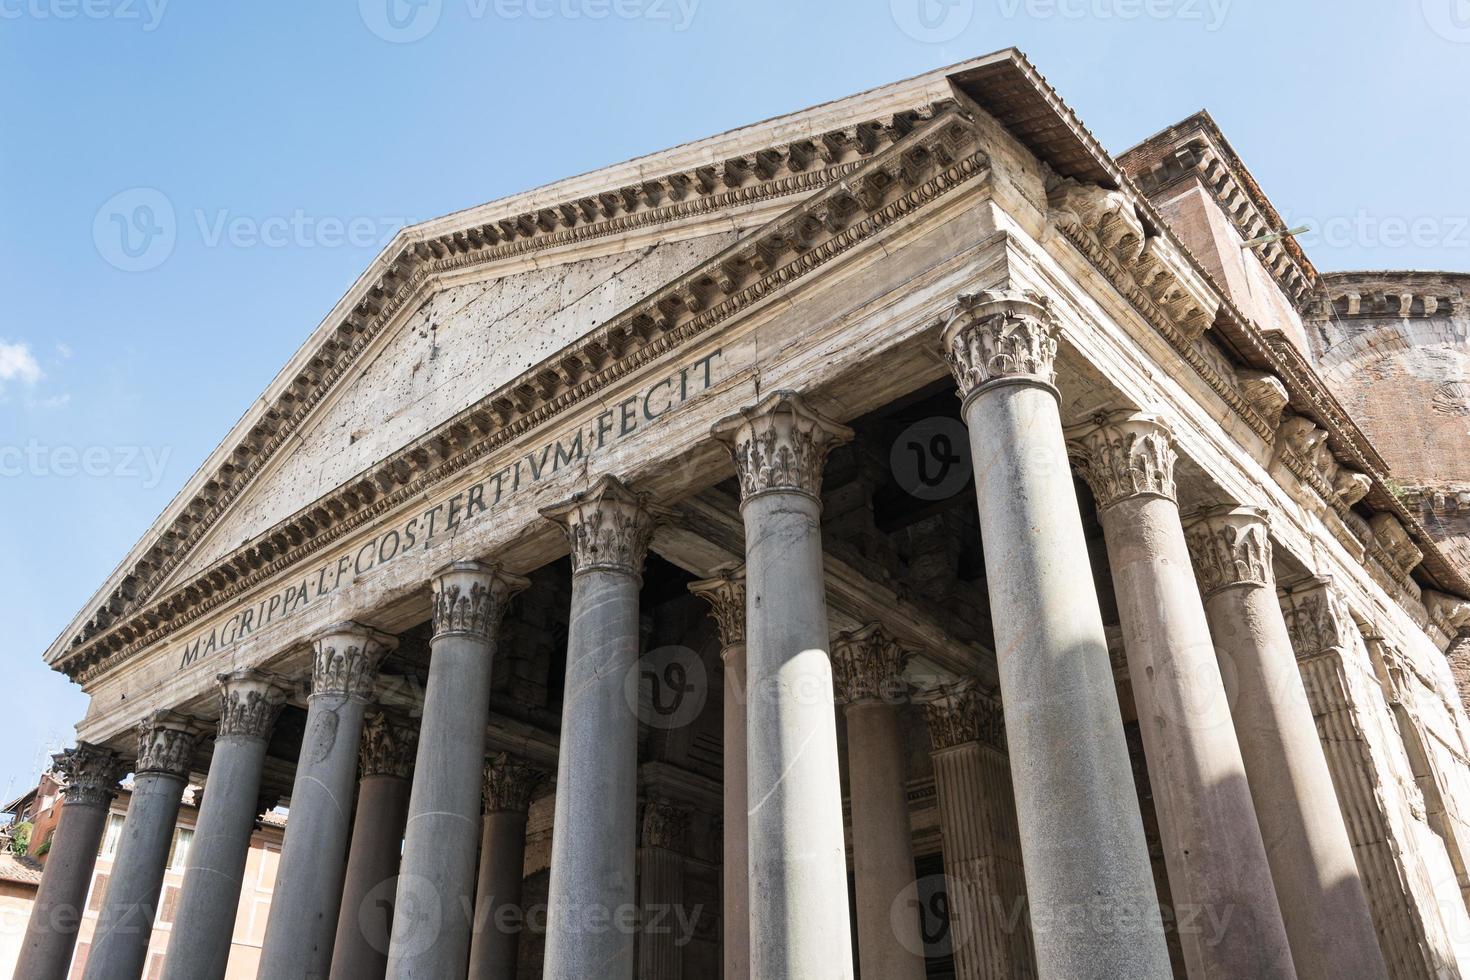 panteon, Rom, Italien foto